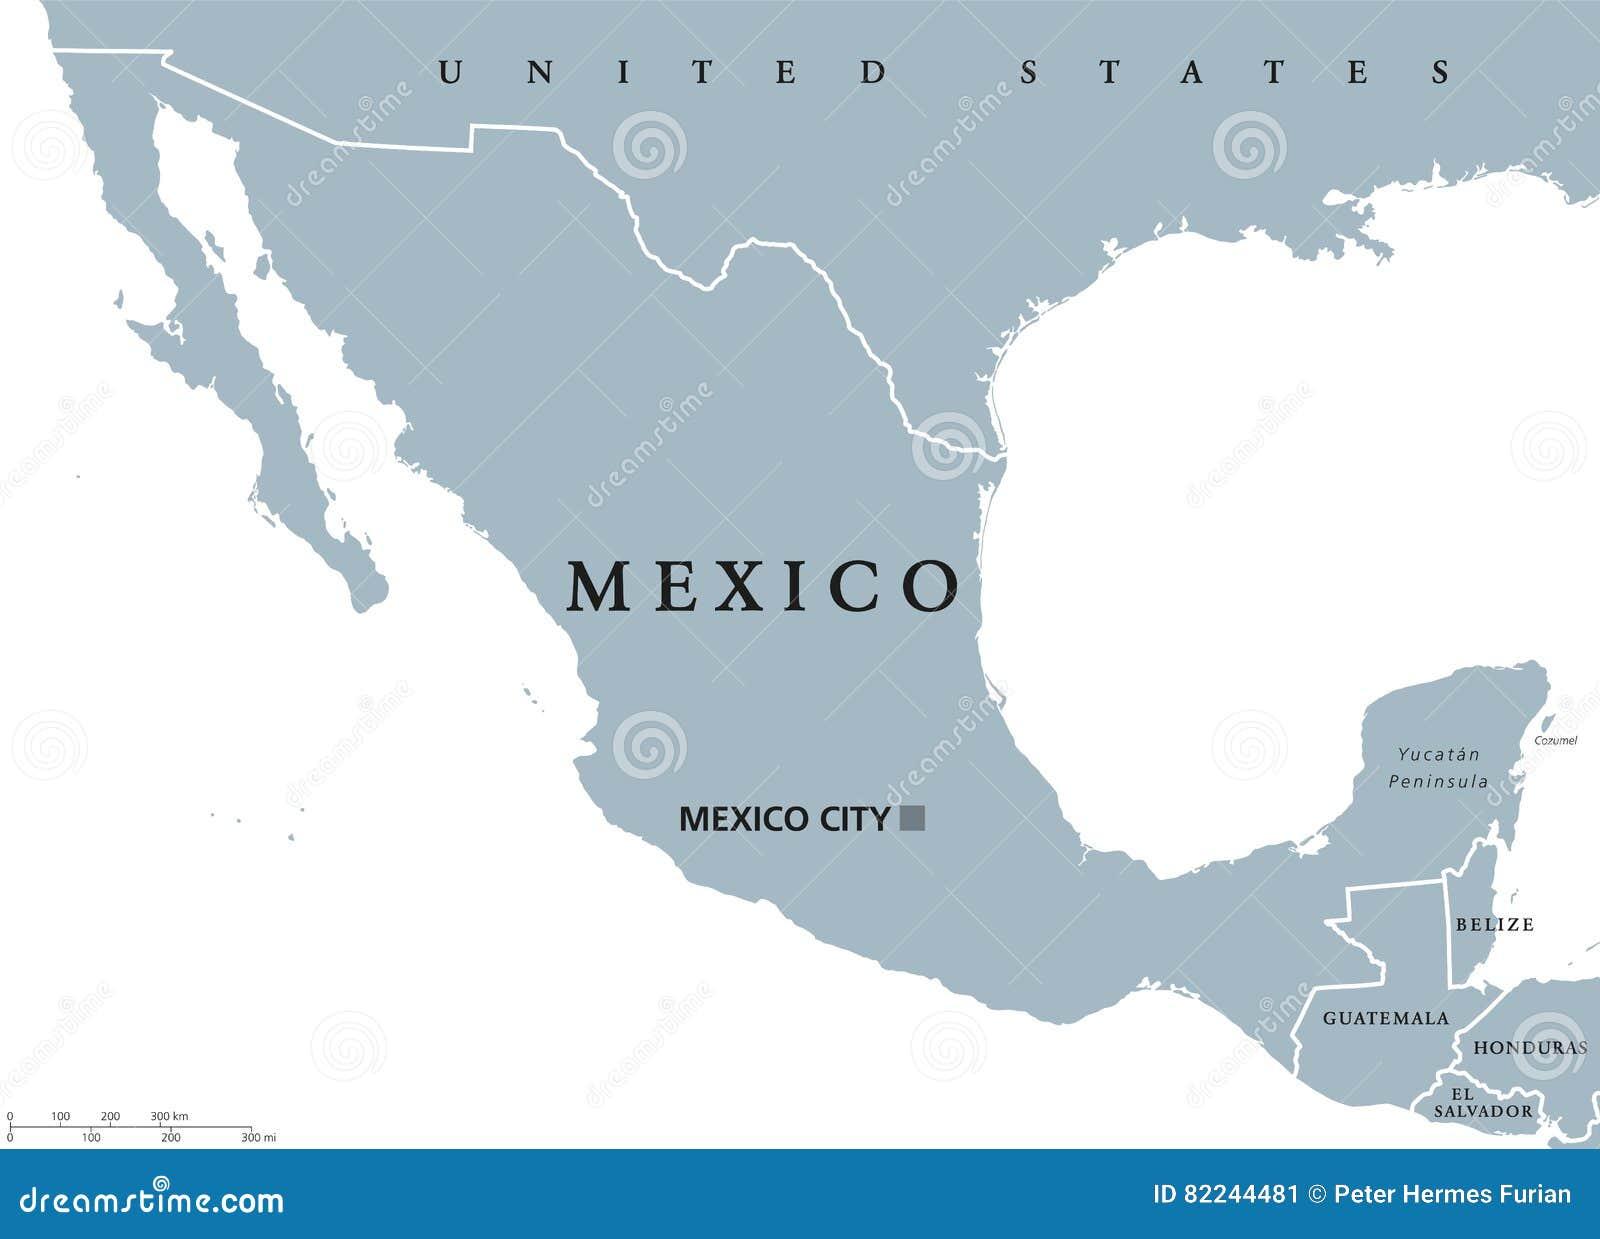 Mexiko Staaten Karte.Politische Karte Mexikos Vektor Abbildung Illustration Von